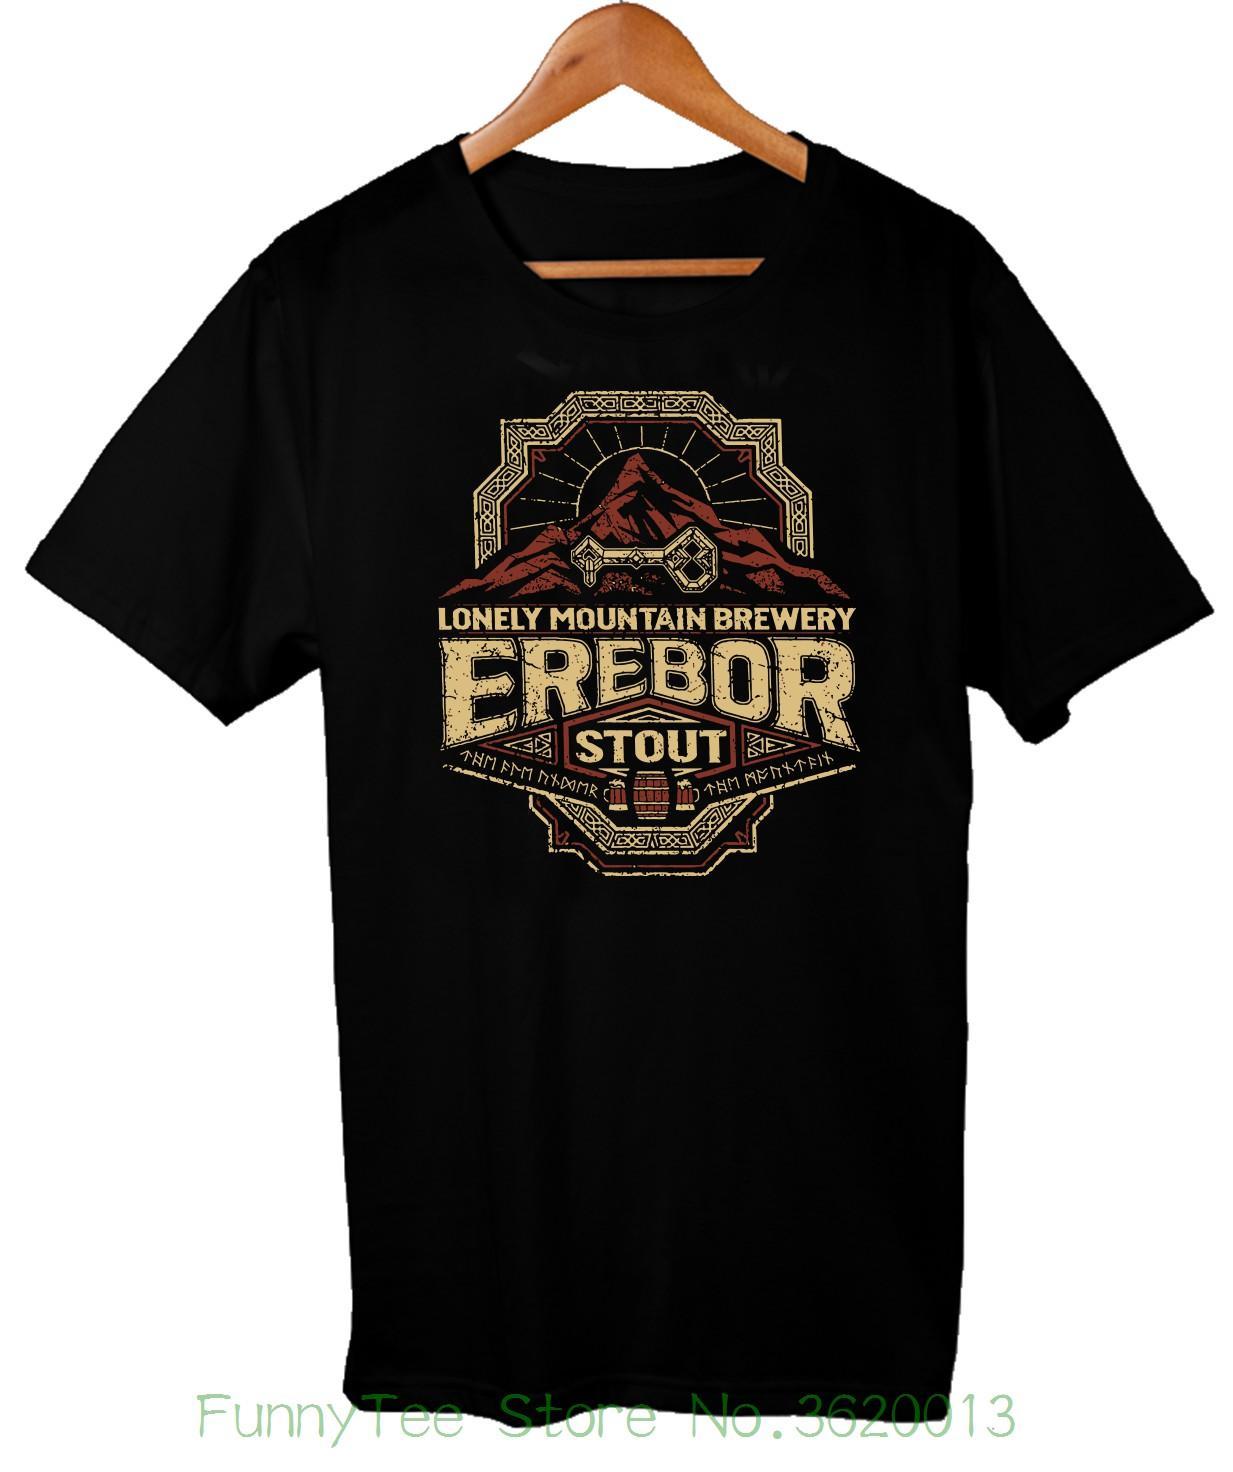 c9fb4abcf0167b Großhandel Herr Der Ringe Erebor Stout Trinken T Shirt Men '; S Komödie T  Shirt Von Aaa888teesstore, $22.68 Auf De.Dhgate.Com | Dhgate